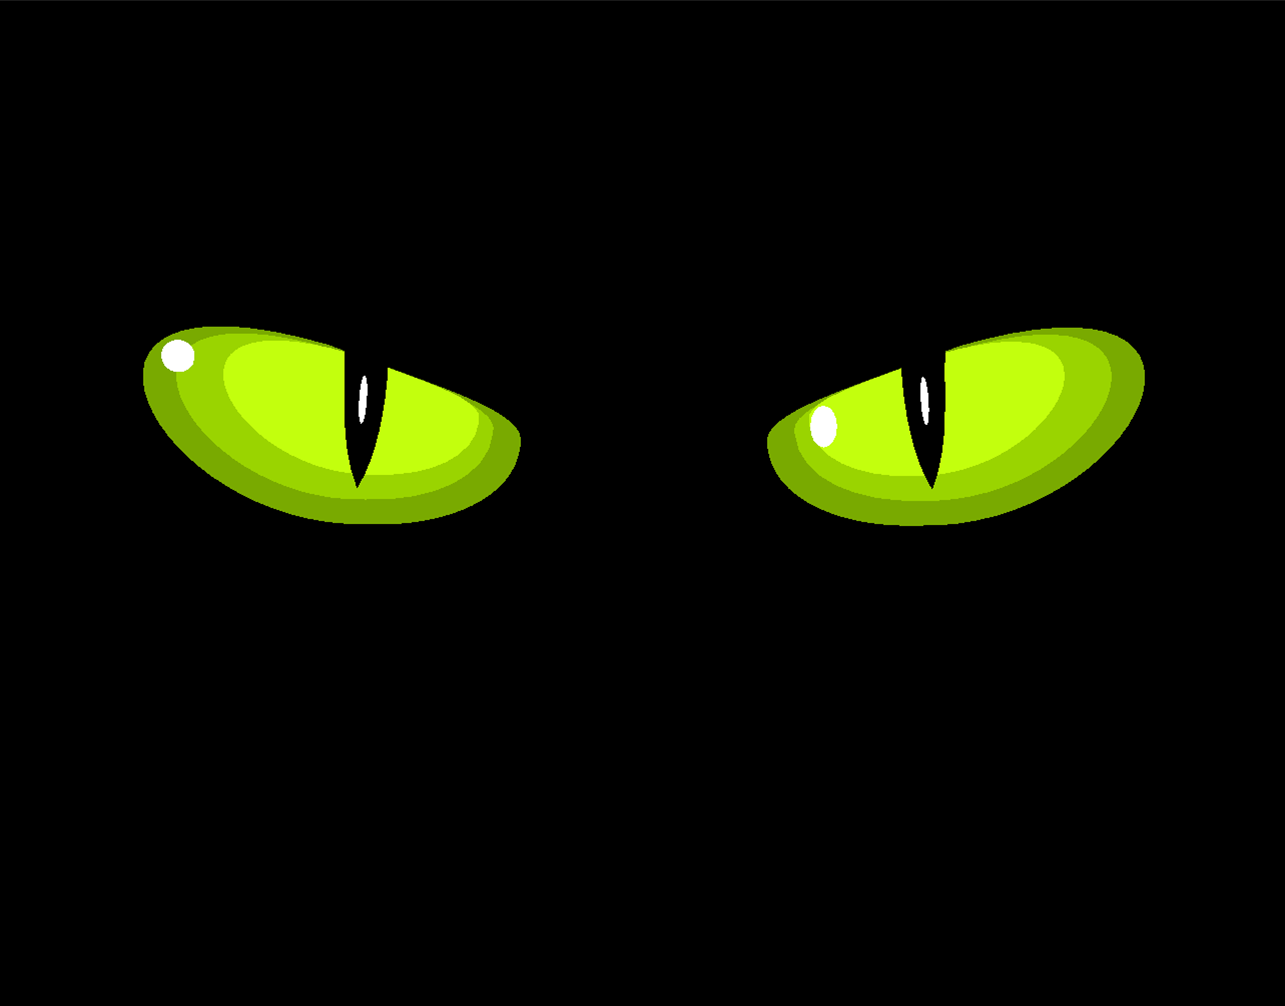 Koobface servers go dark